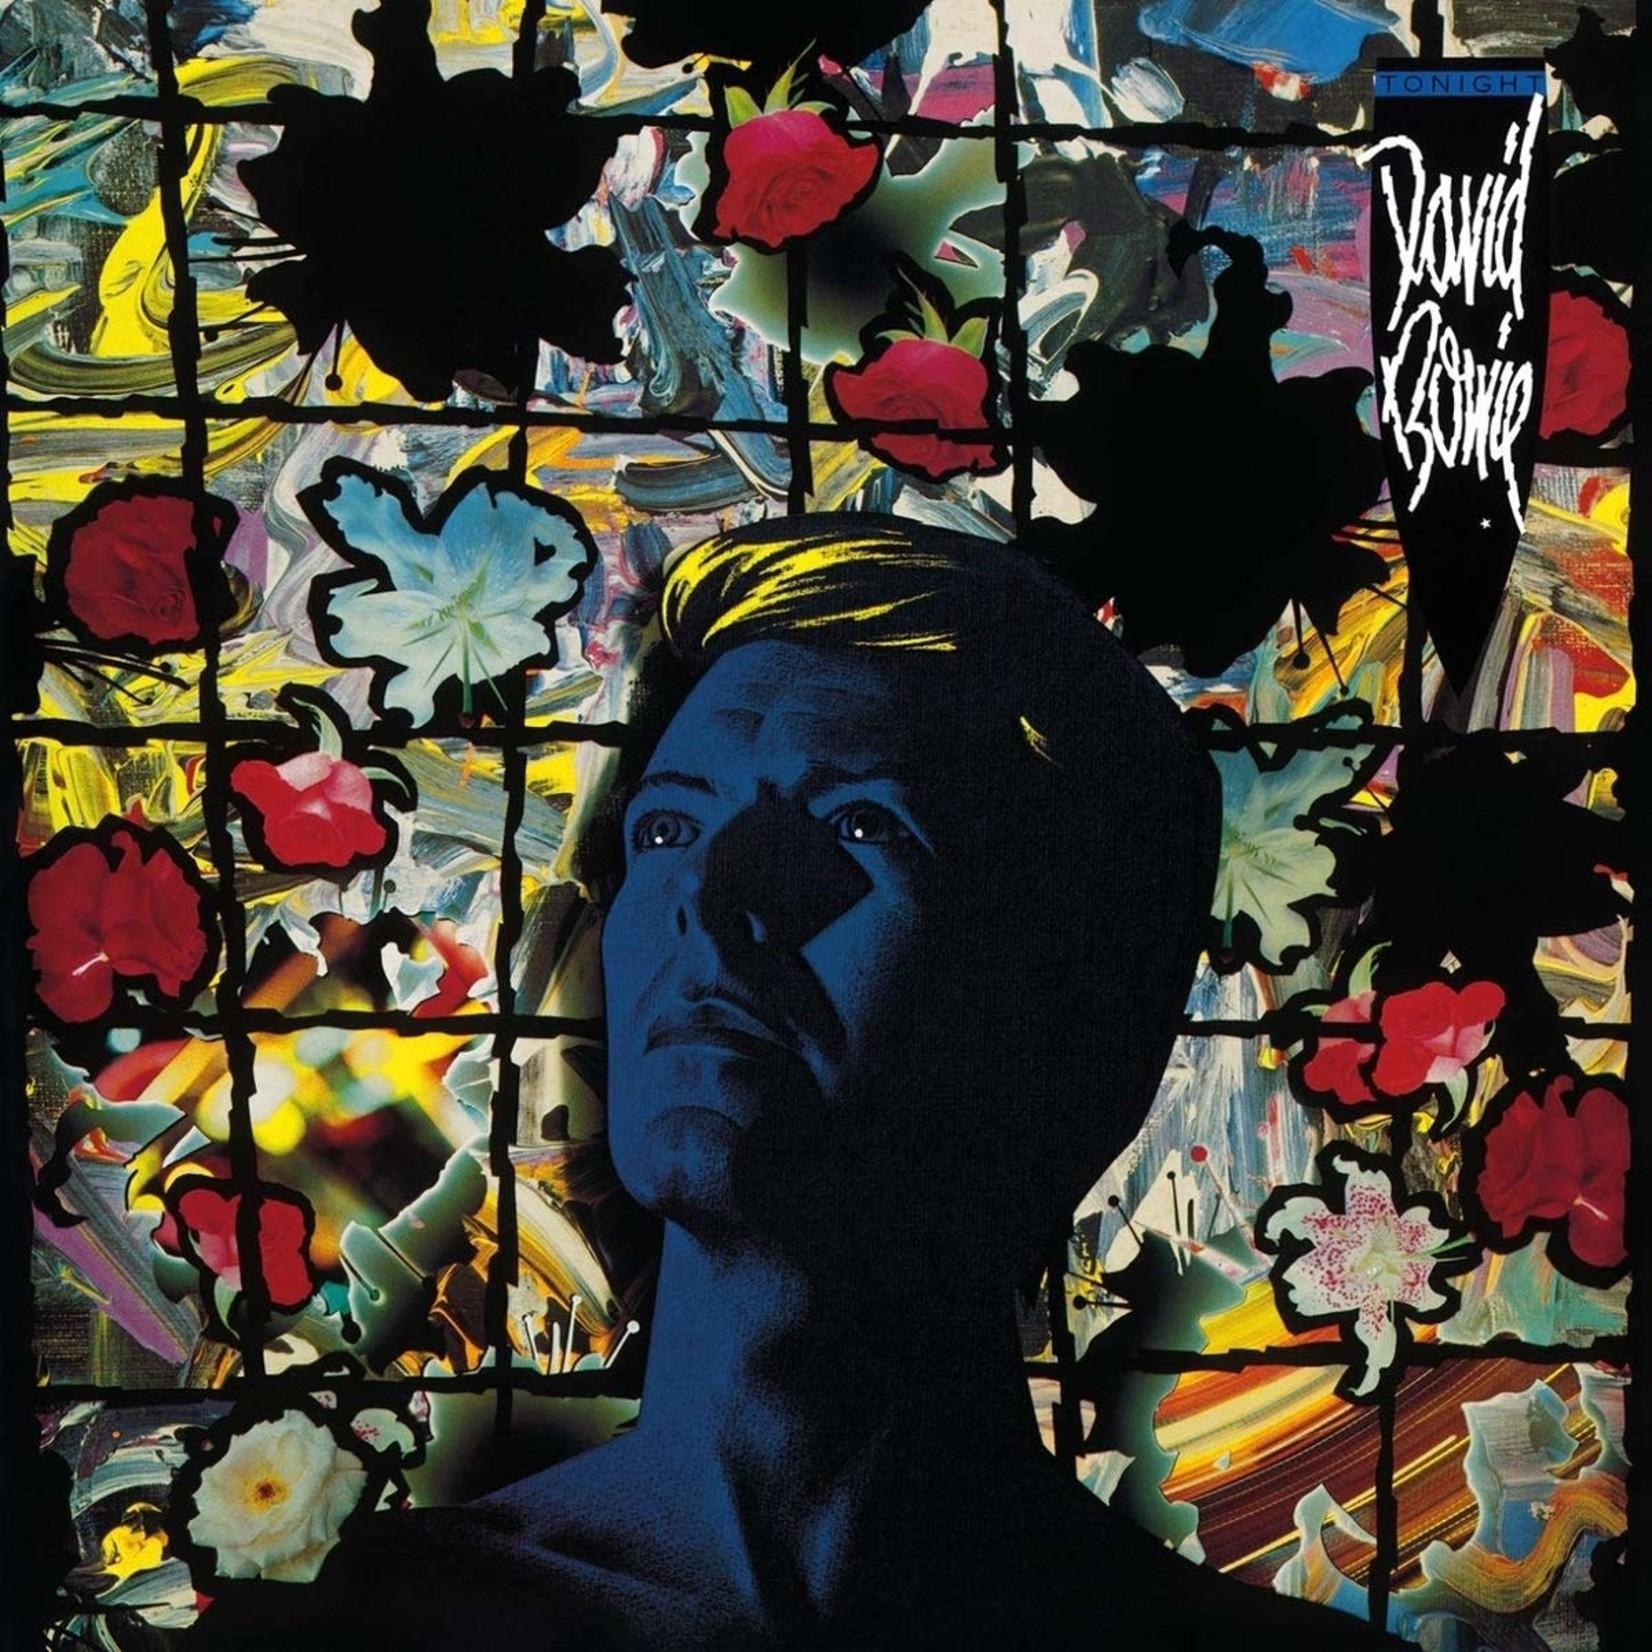 [New] Bowie, David: Tonight (2018 remaster)